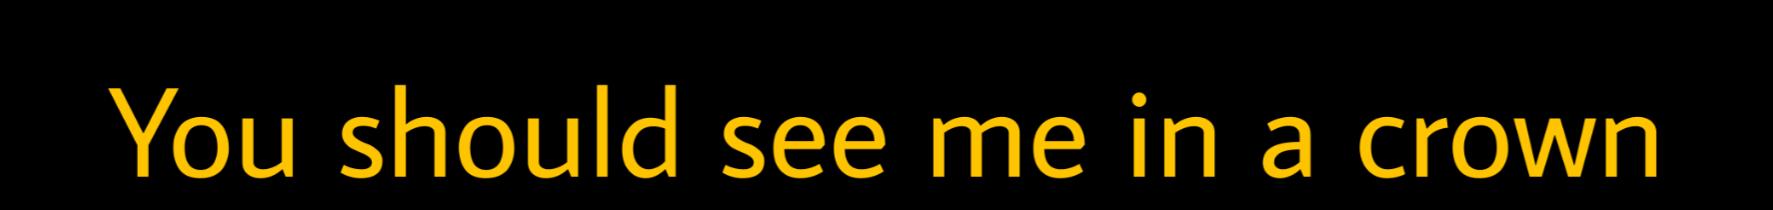 #billieeilish #billieeilishsticker #youshouldseemeinacrown #billieeilishsong #billieeilishlyric #billieeilishtext #billieeilishyellow #quote #music #yellowquote #tumblrquotes #sticker #freetoedit #text #yellowtext